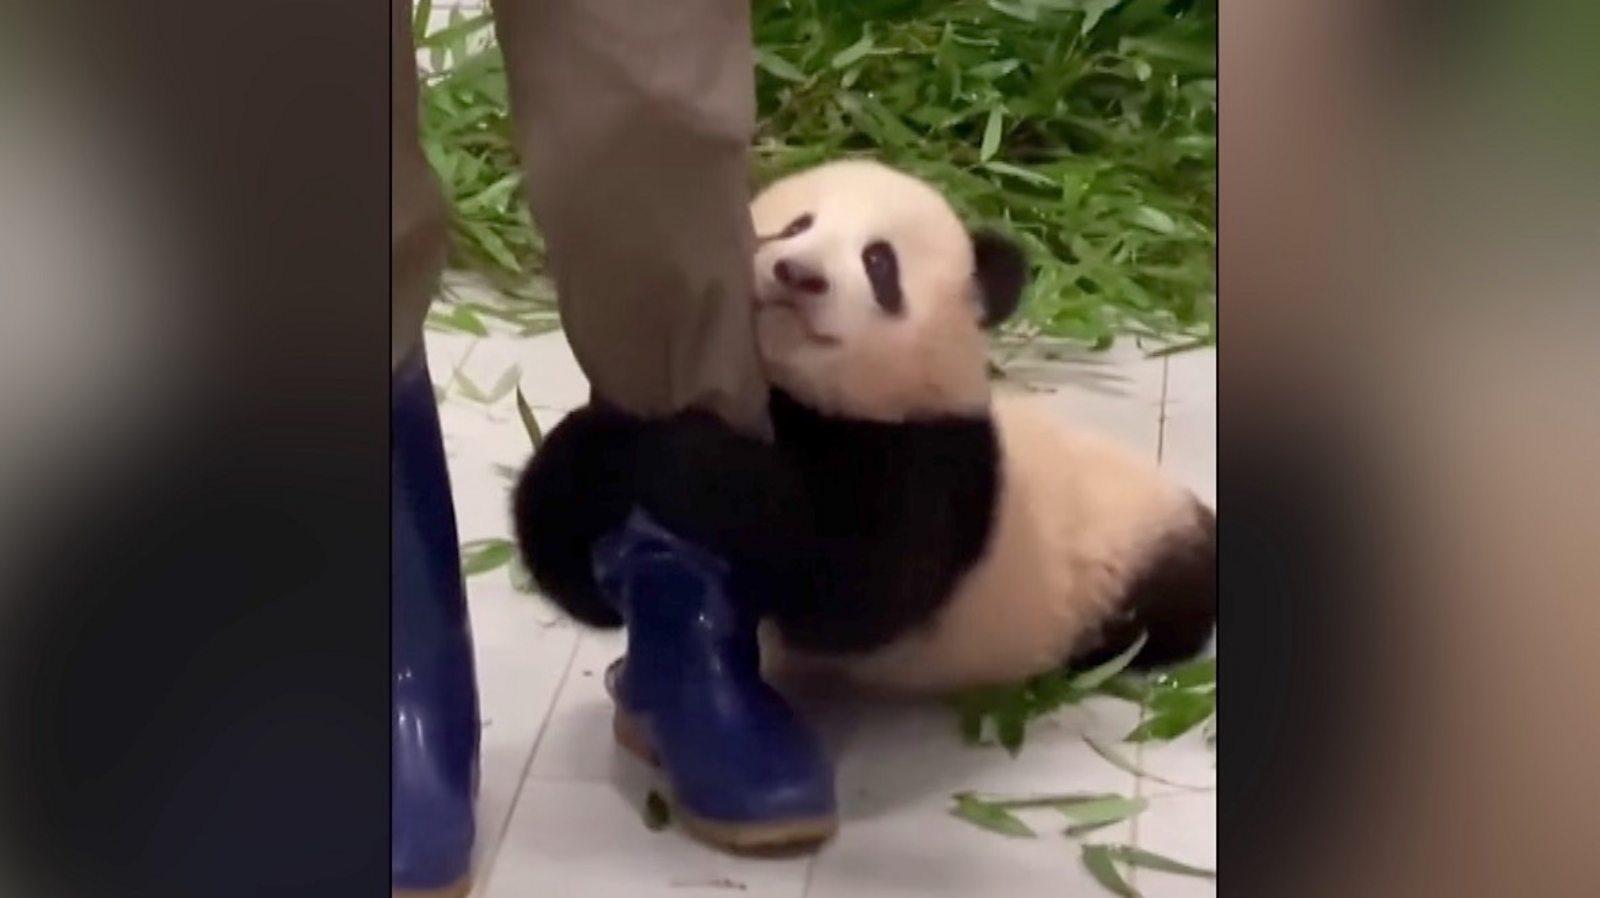 Bear hug: Clingy panda cub video goes viral